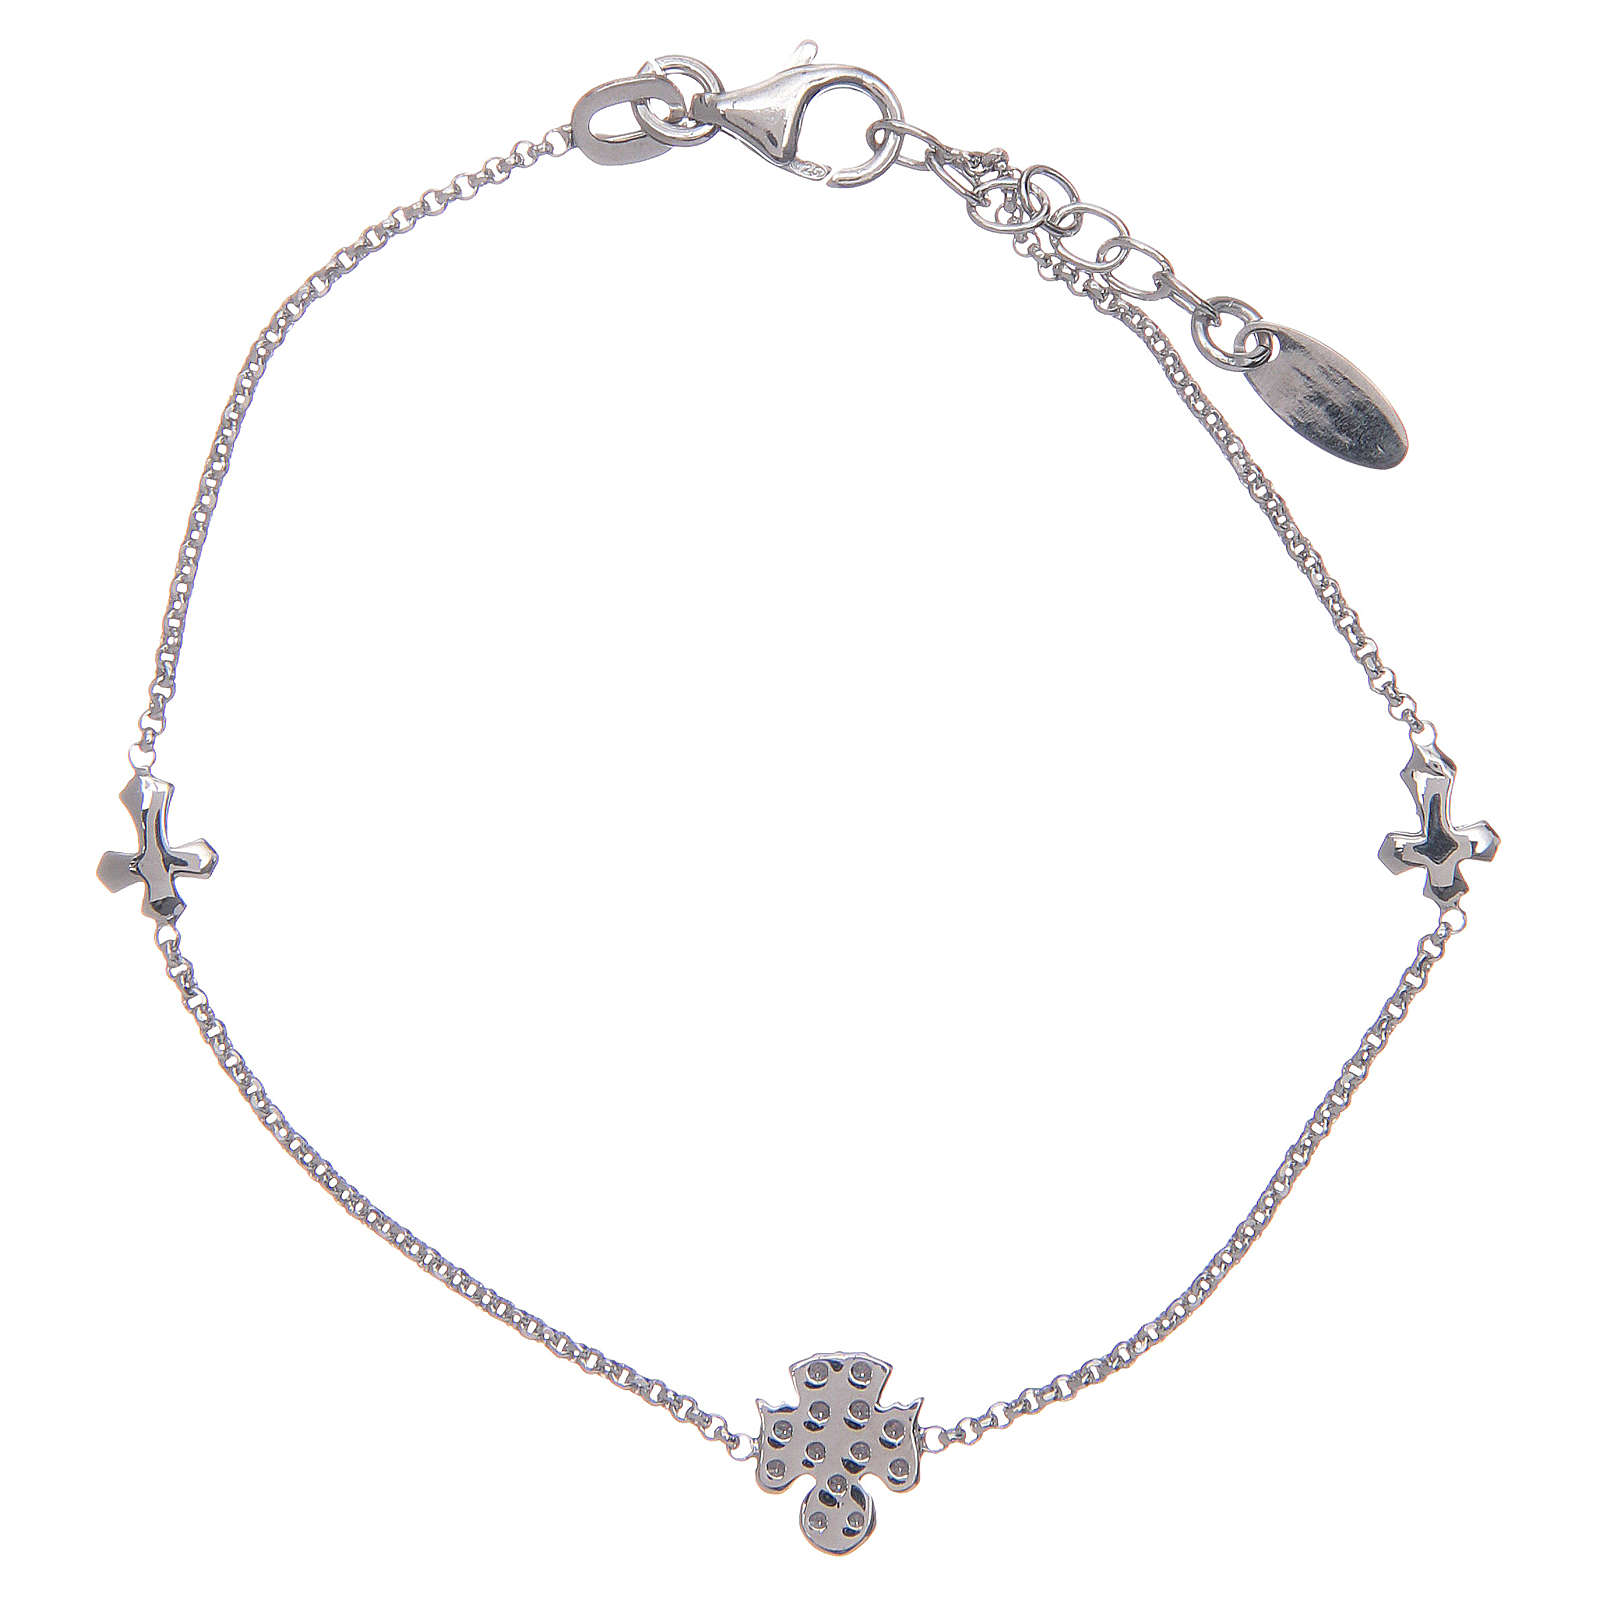 Bracciale Amen Argento 925 croci angelo zirconi 4